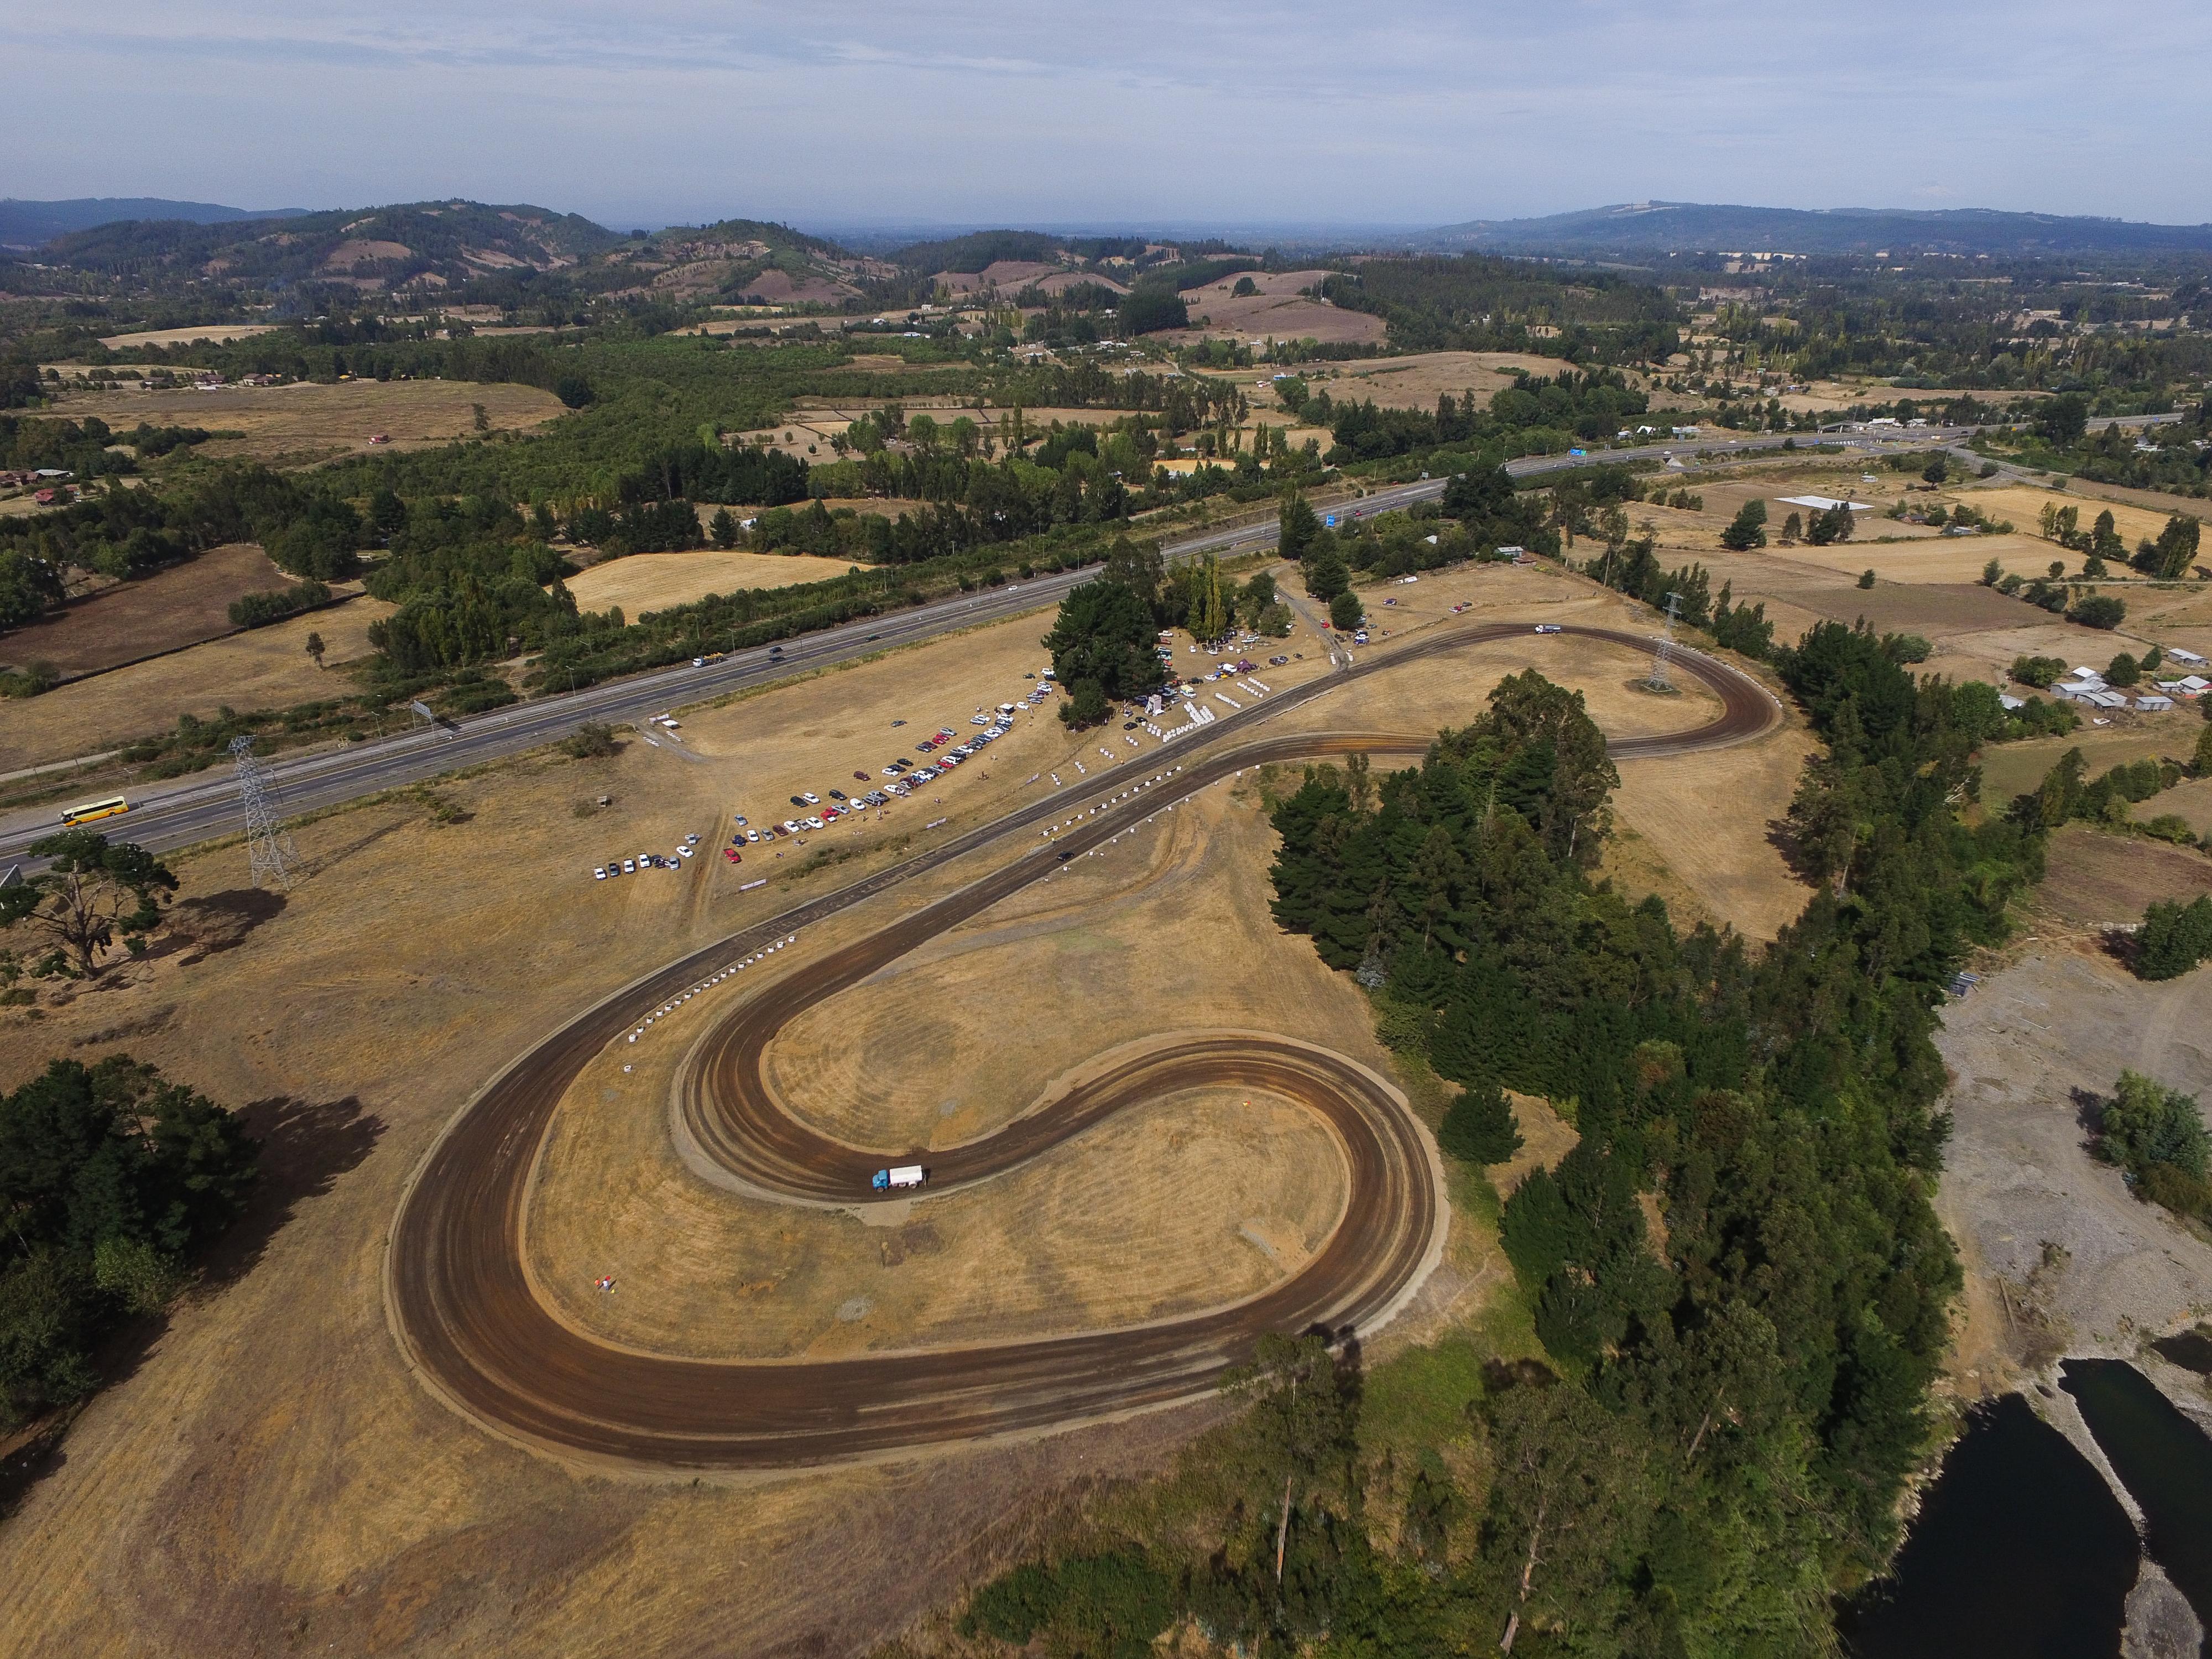 Autódromo Bajo Pinar